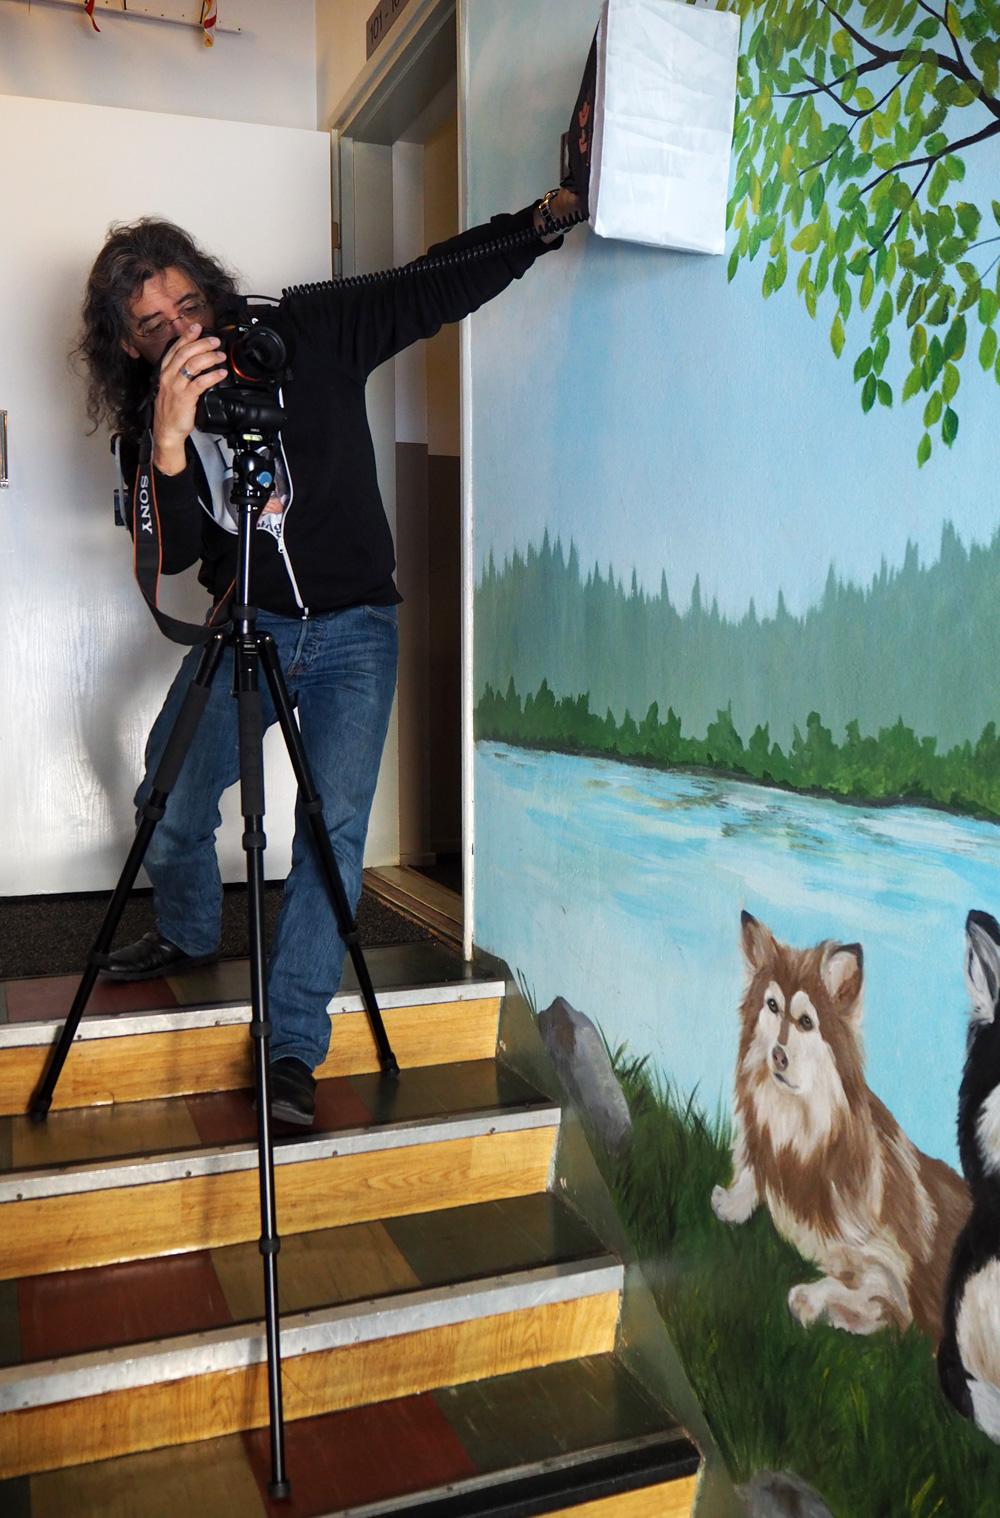 Donald_Guesthaus_Borealis_Rovaniemi_Parasta_matkalla_blogi